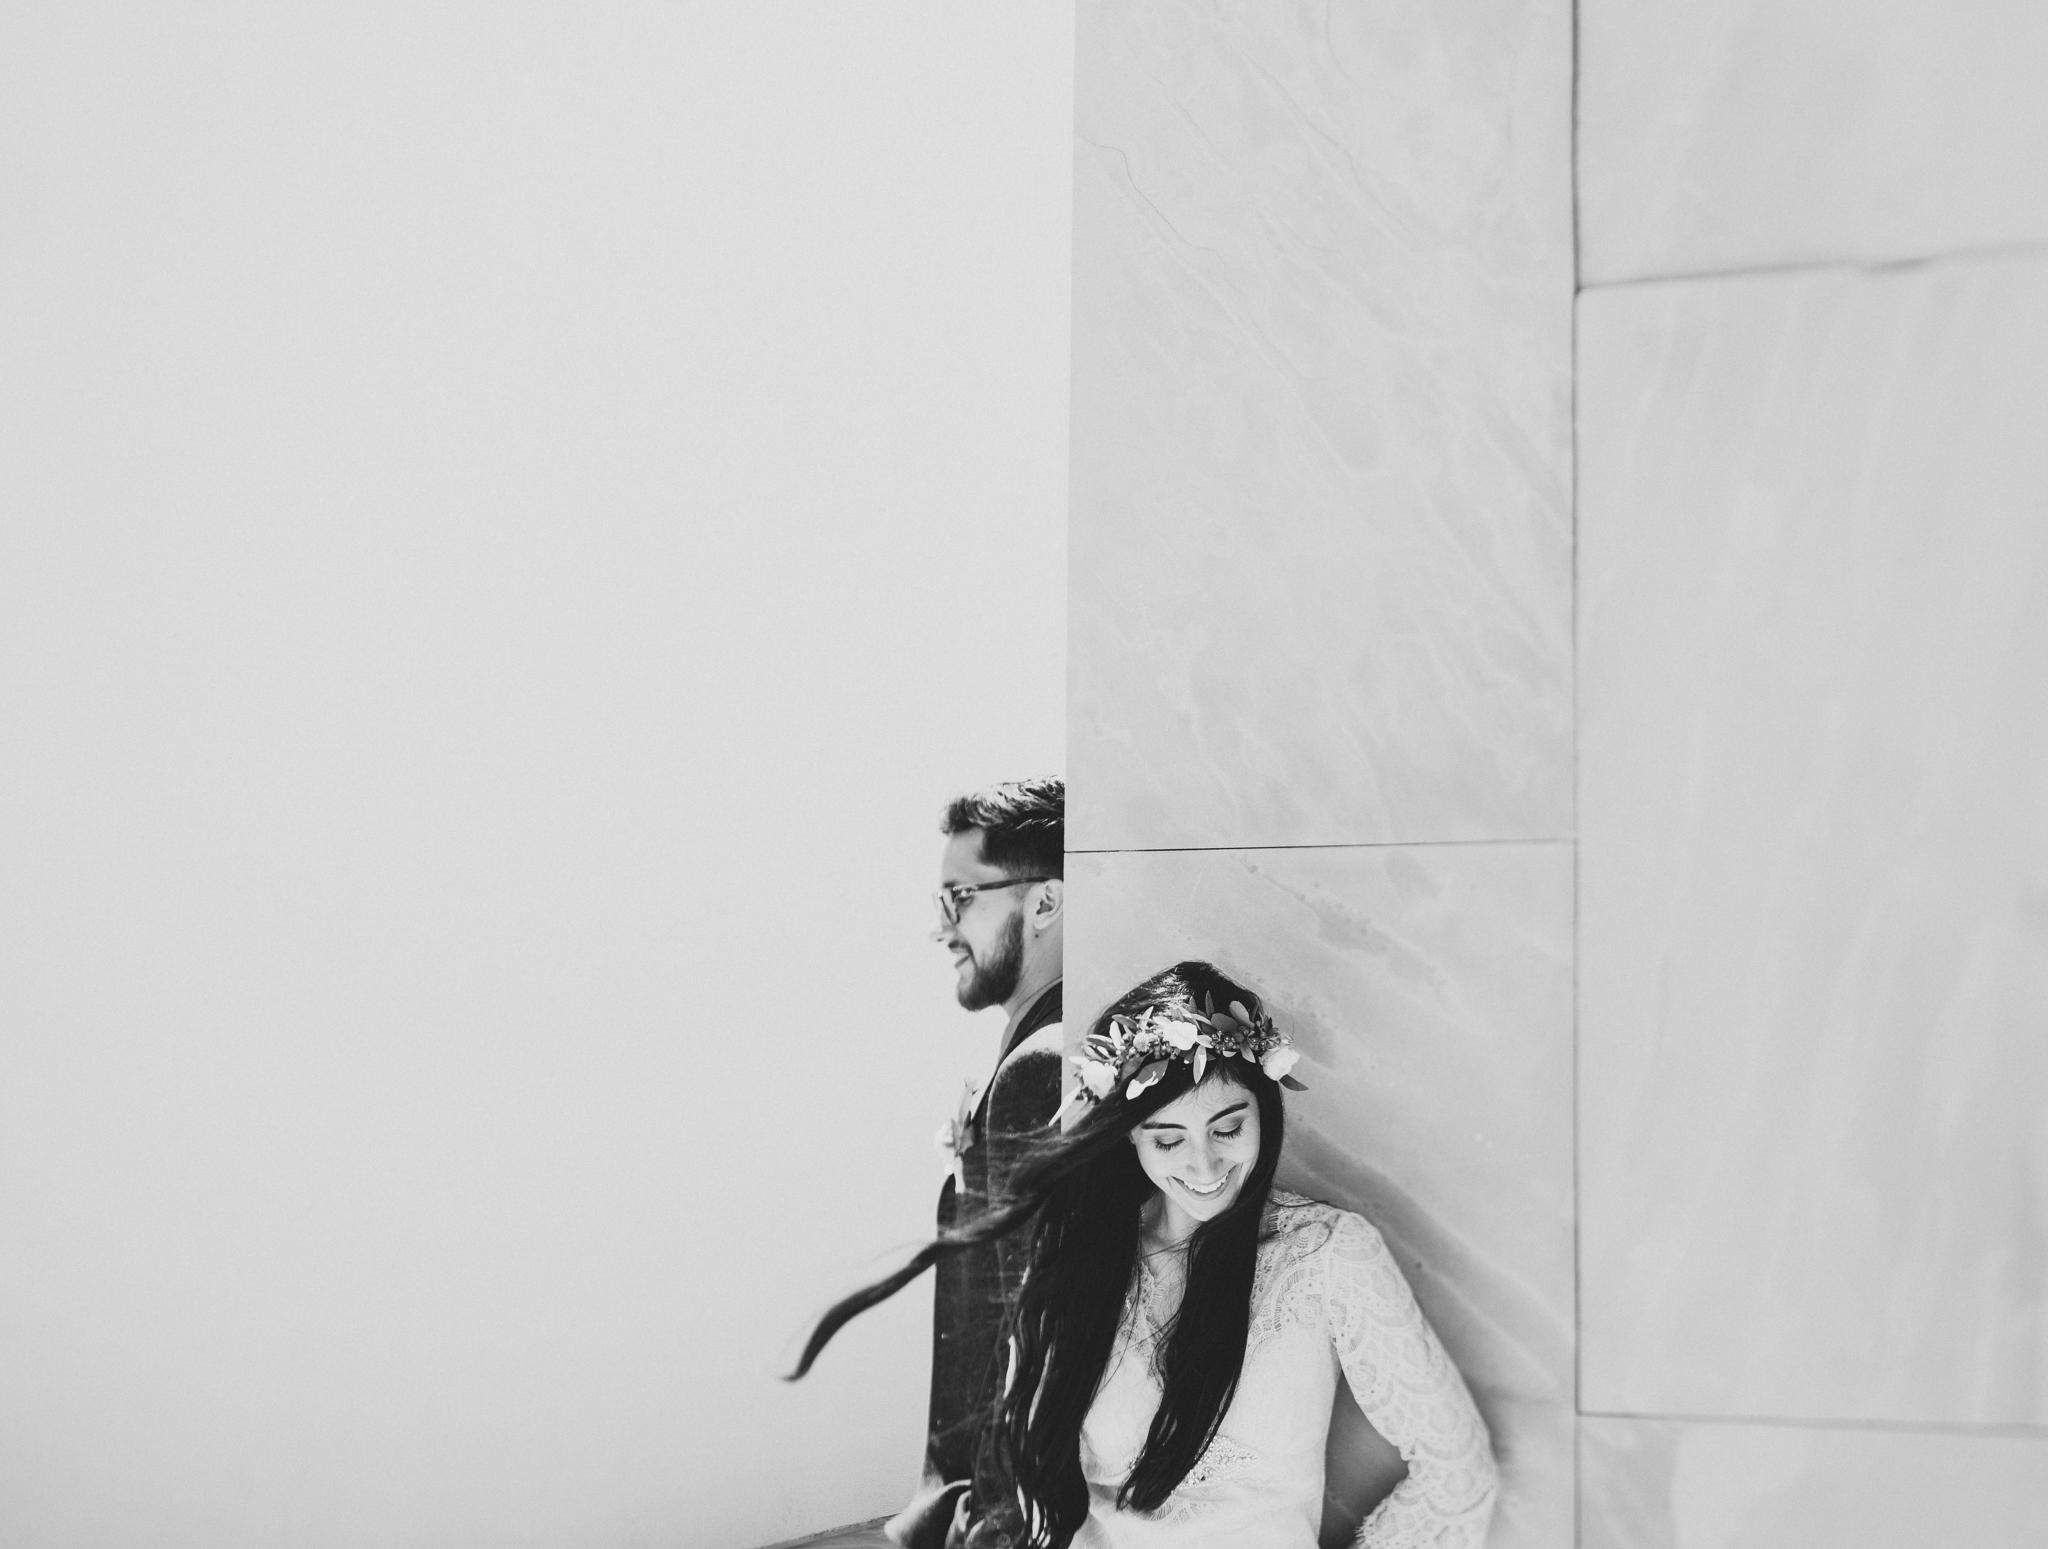 ©Isaiah-&-Taylor-Photography---Oak-Canyon-Nature-Center-Wedding,-Anaheim-Hills-073.jpg